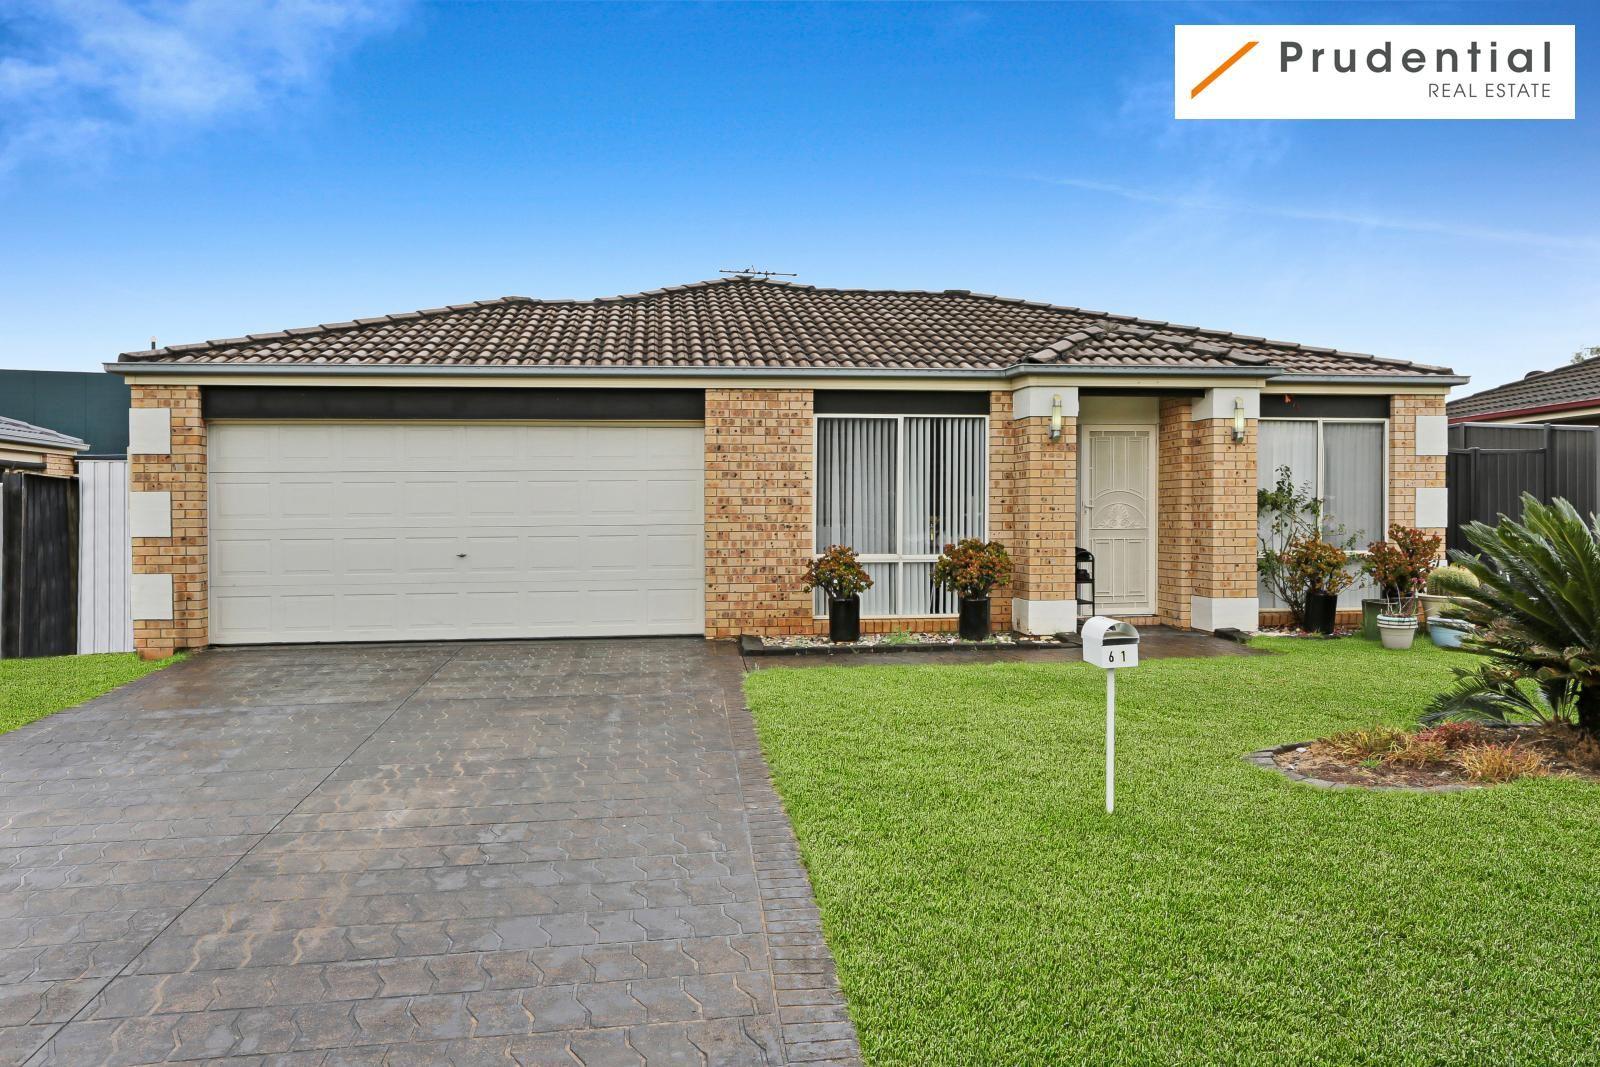 61 John Kidd Drive, Blair Athol NSW 2560, Image 0